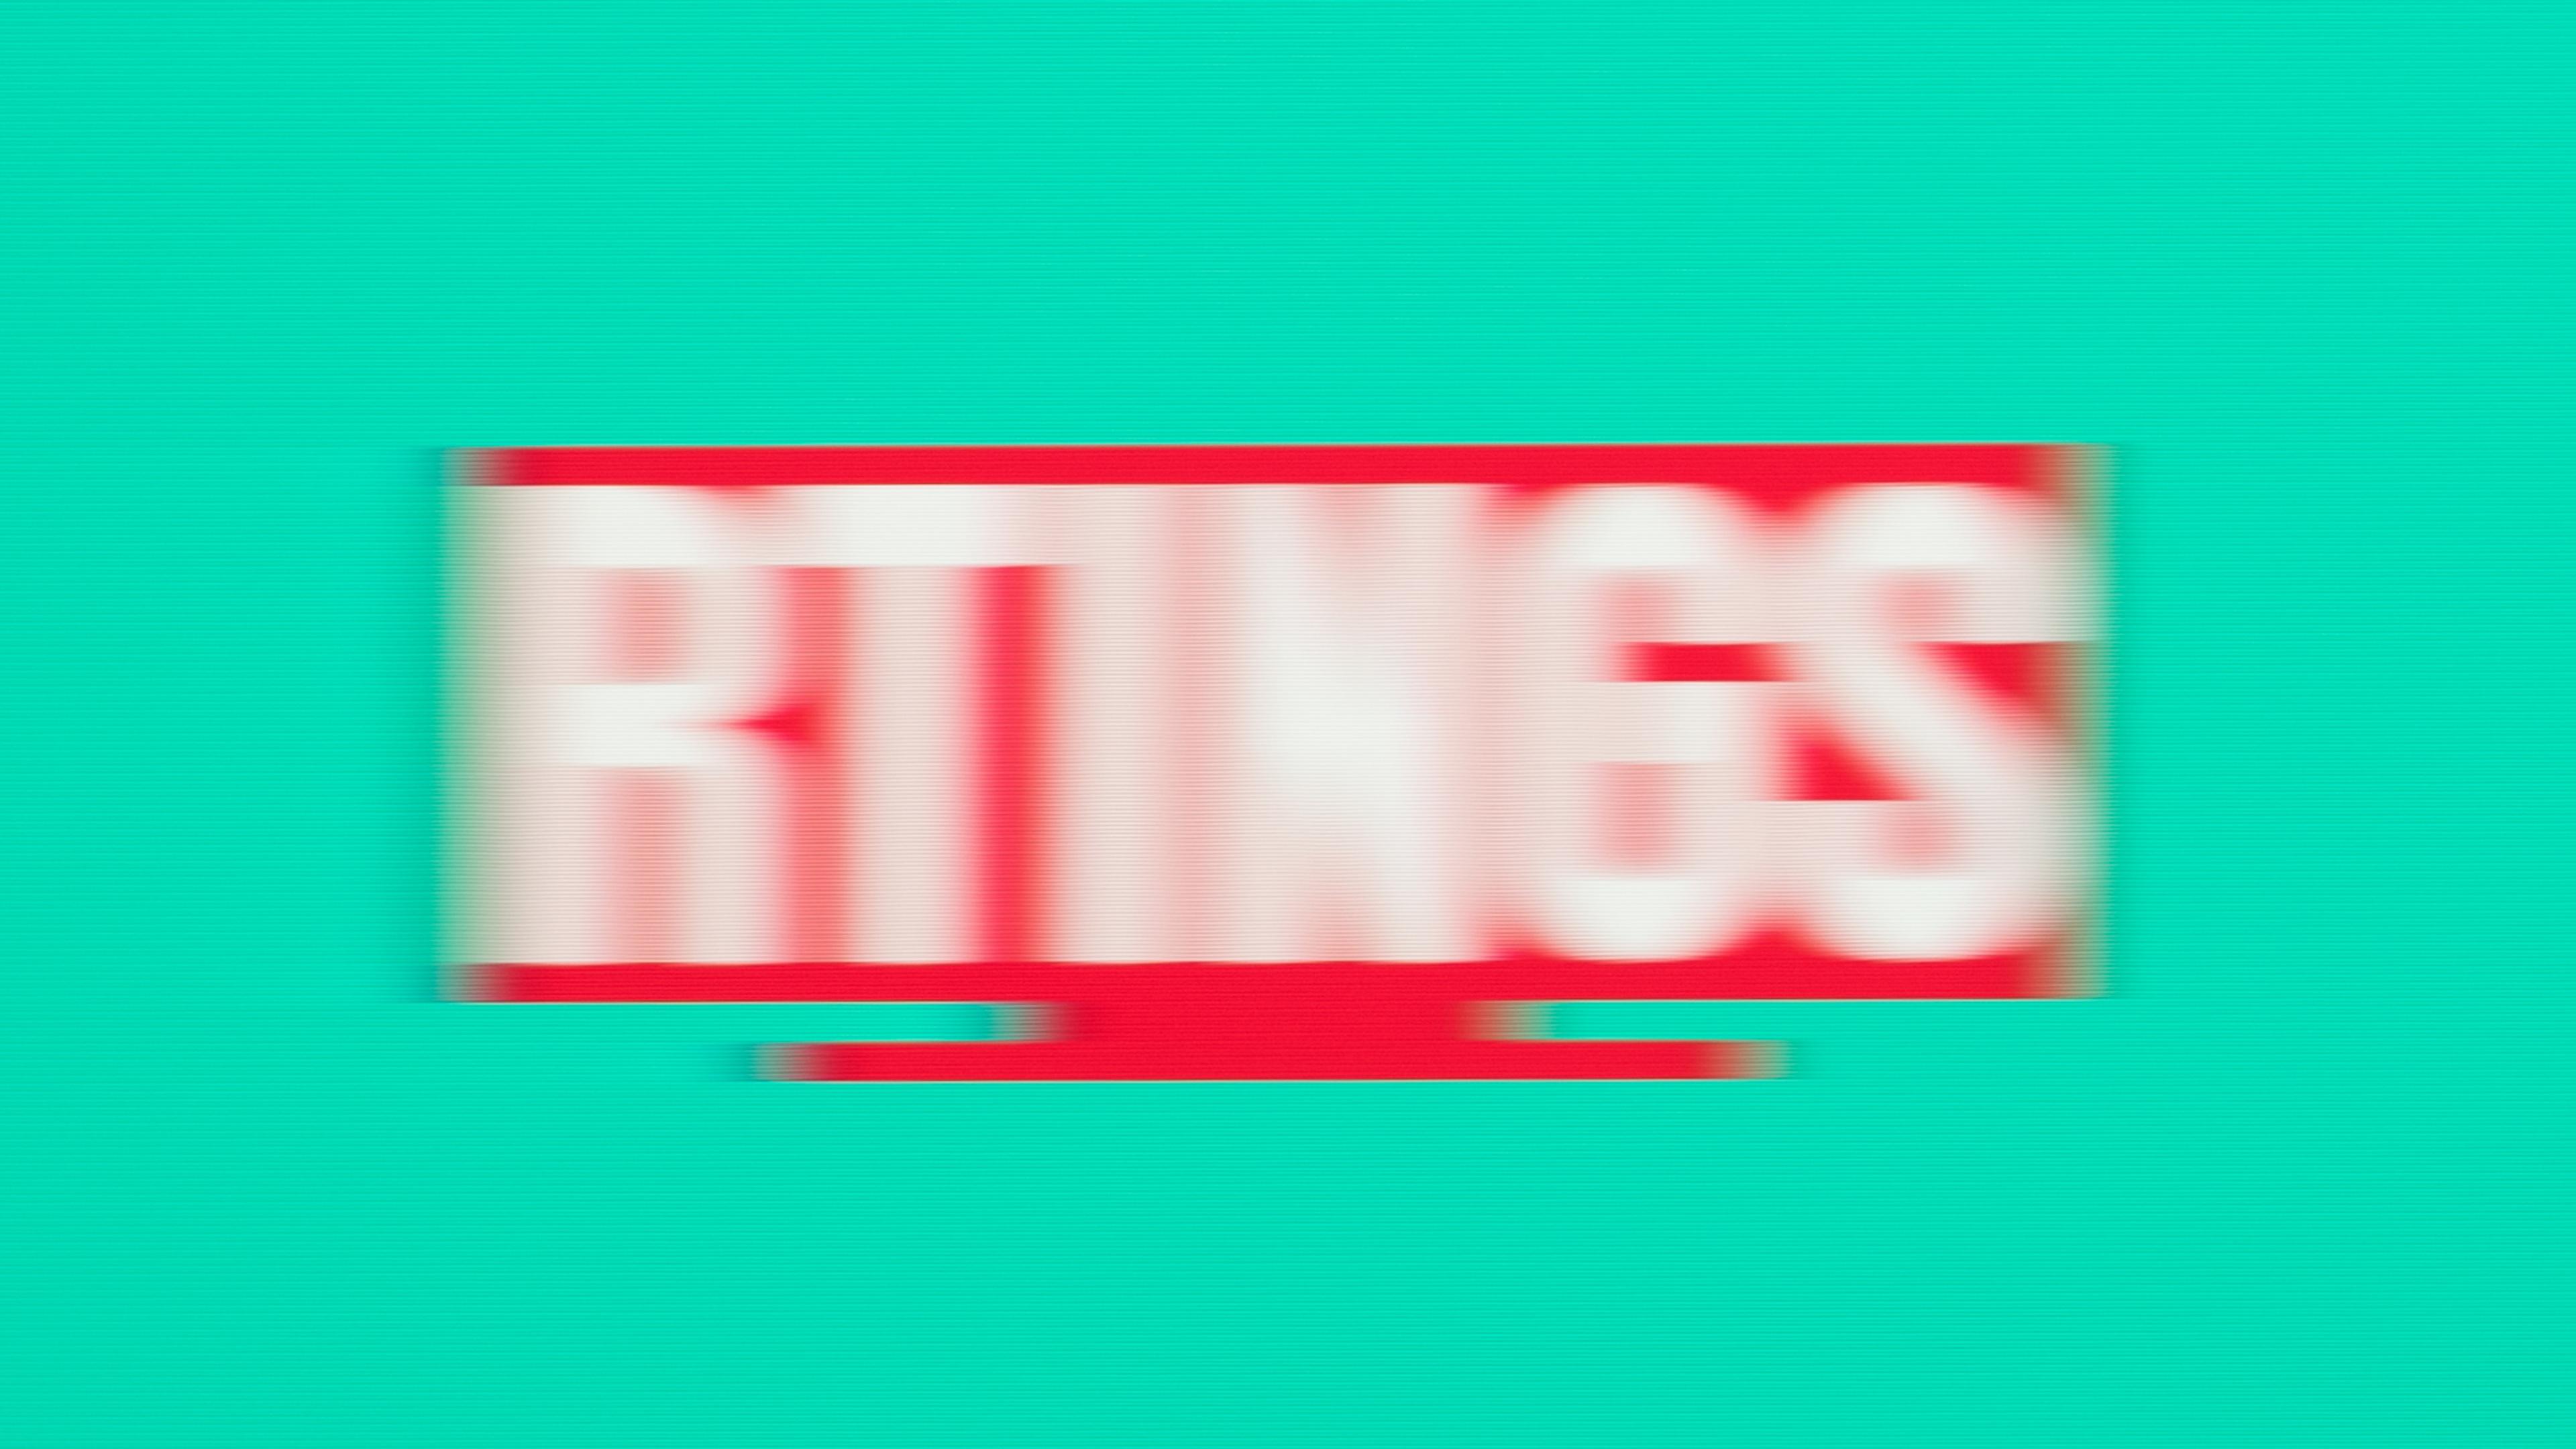 Motion Blur Of Monitors - RTINGS com